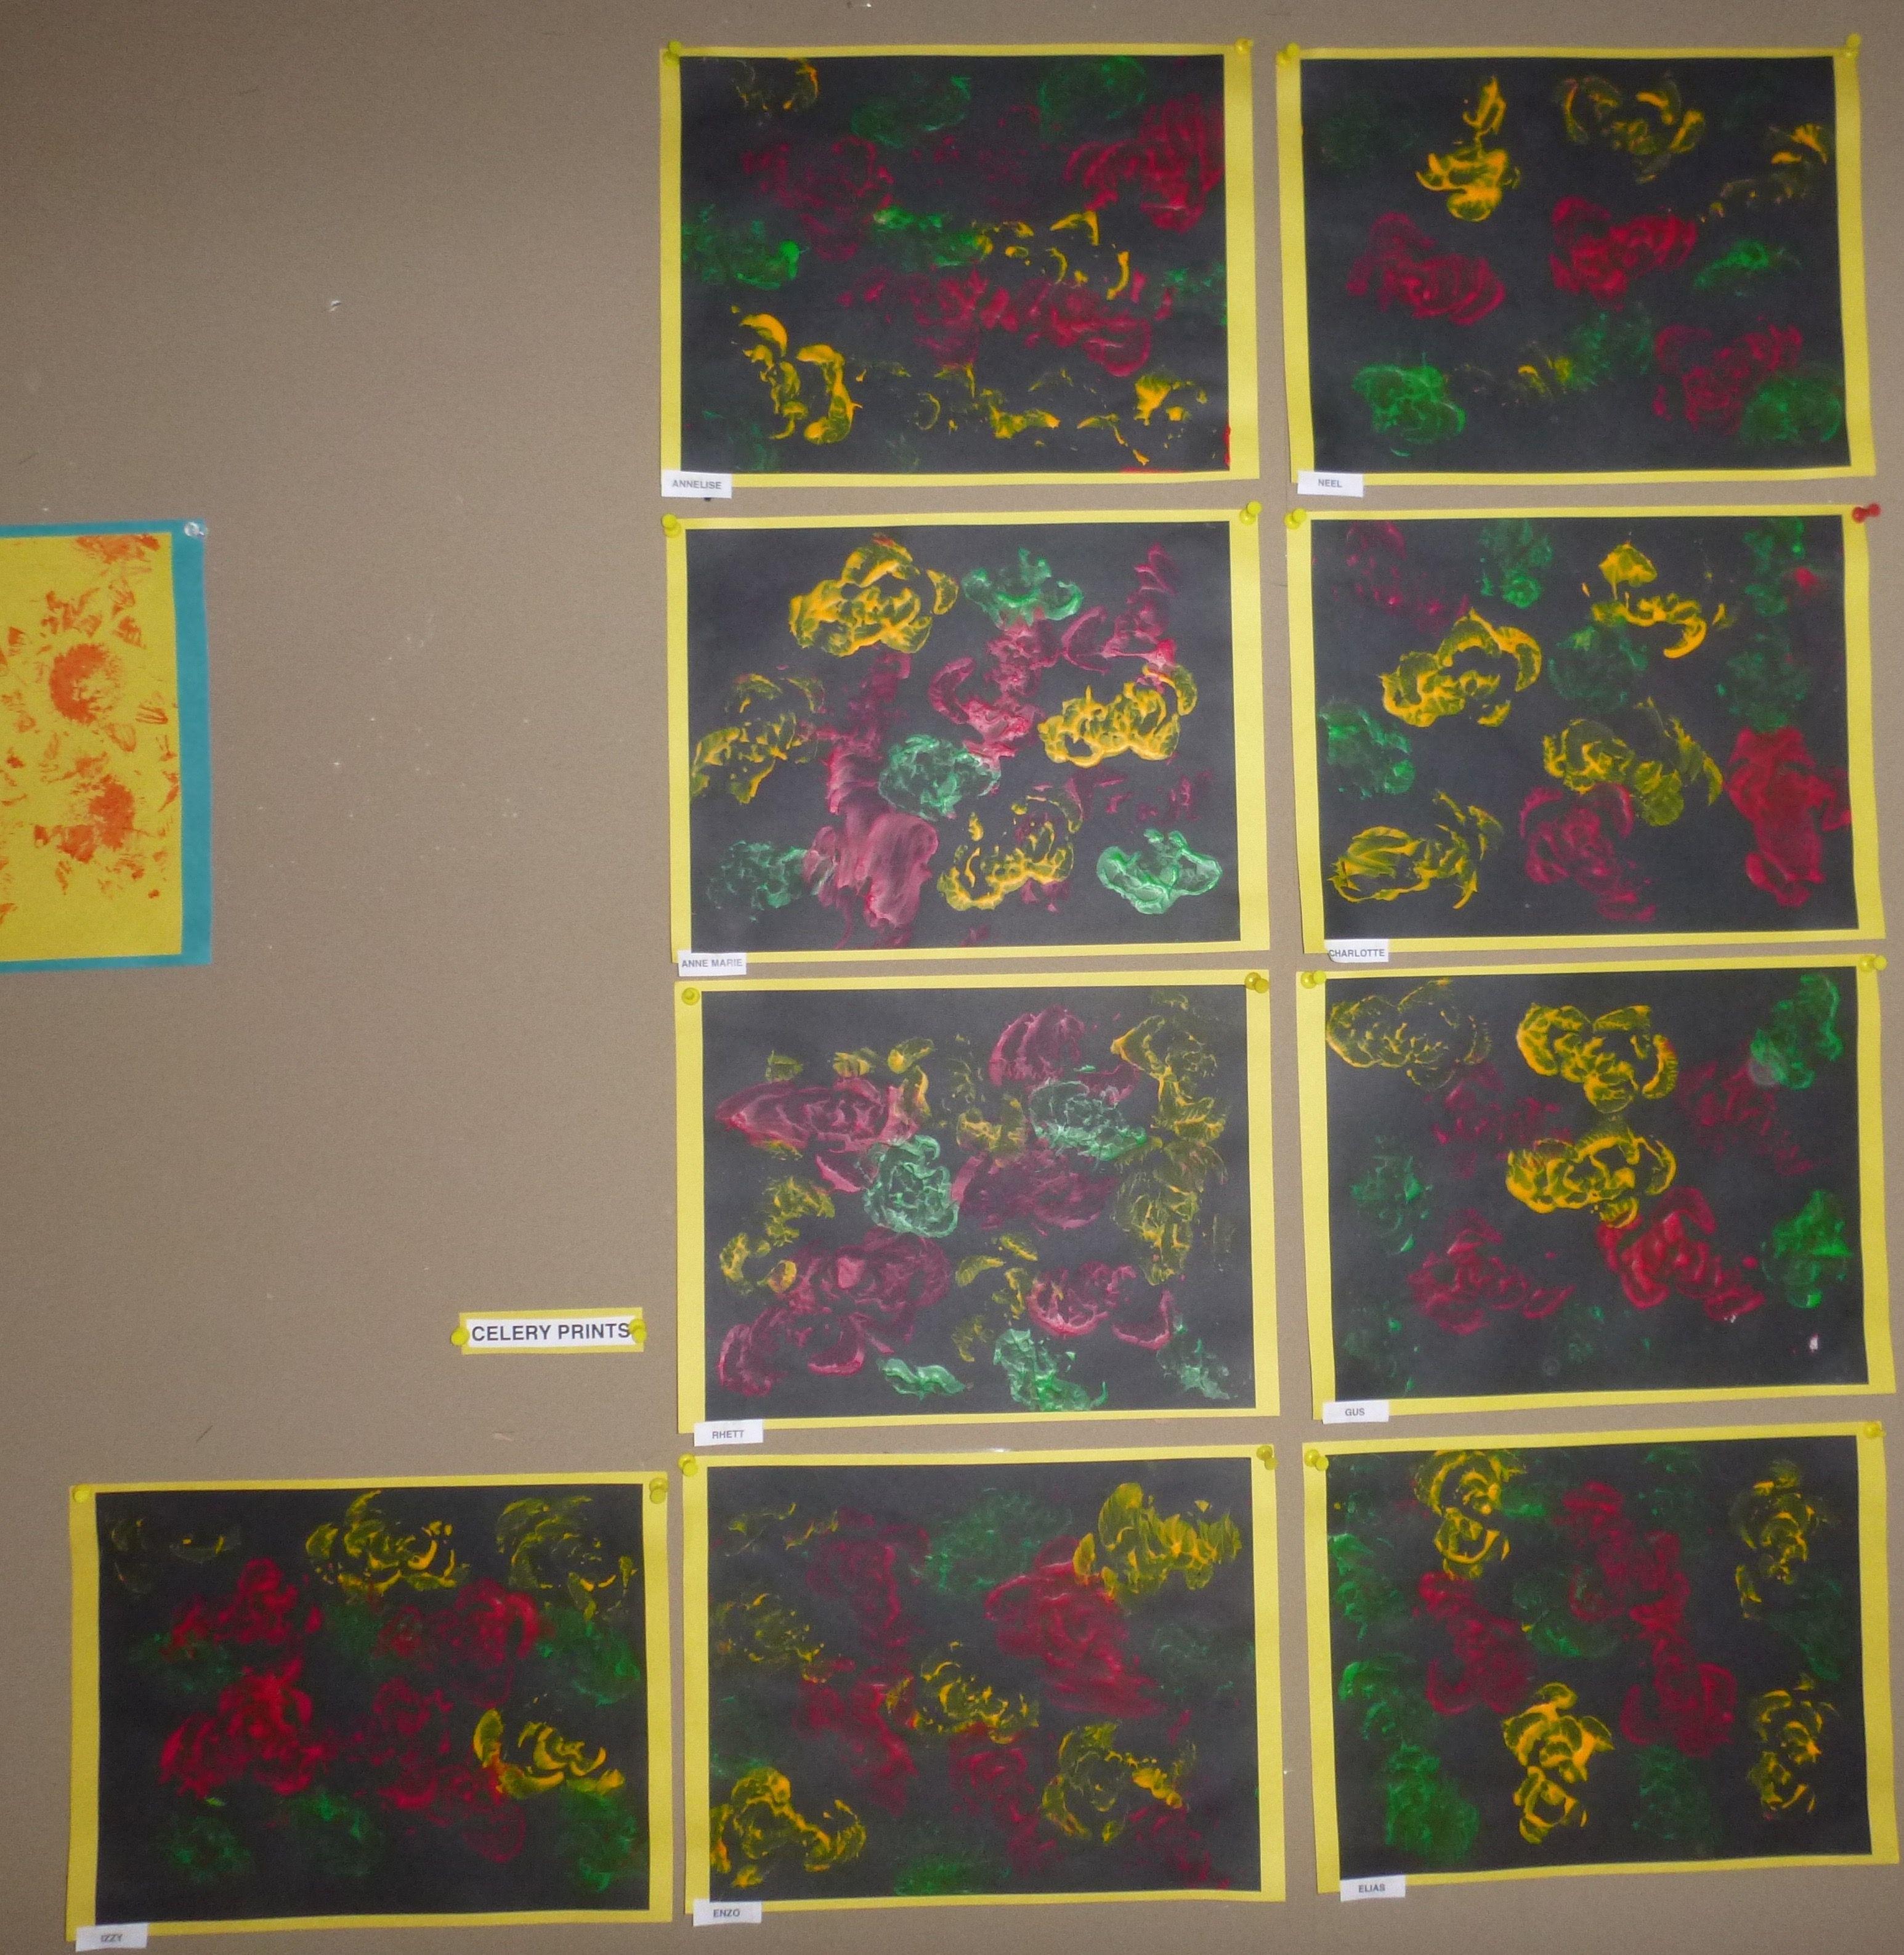 Celery Prints With Tempera